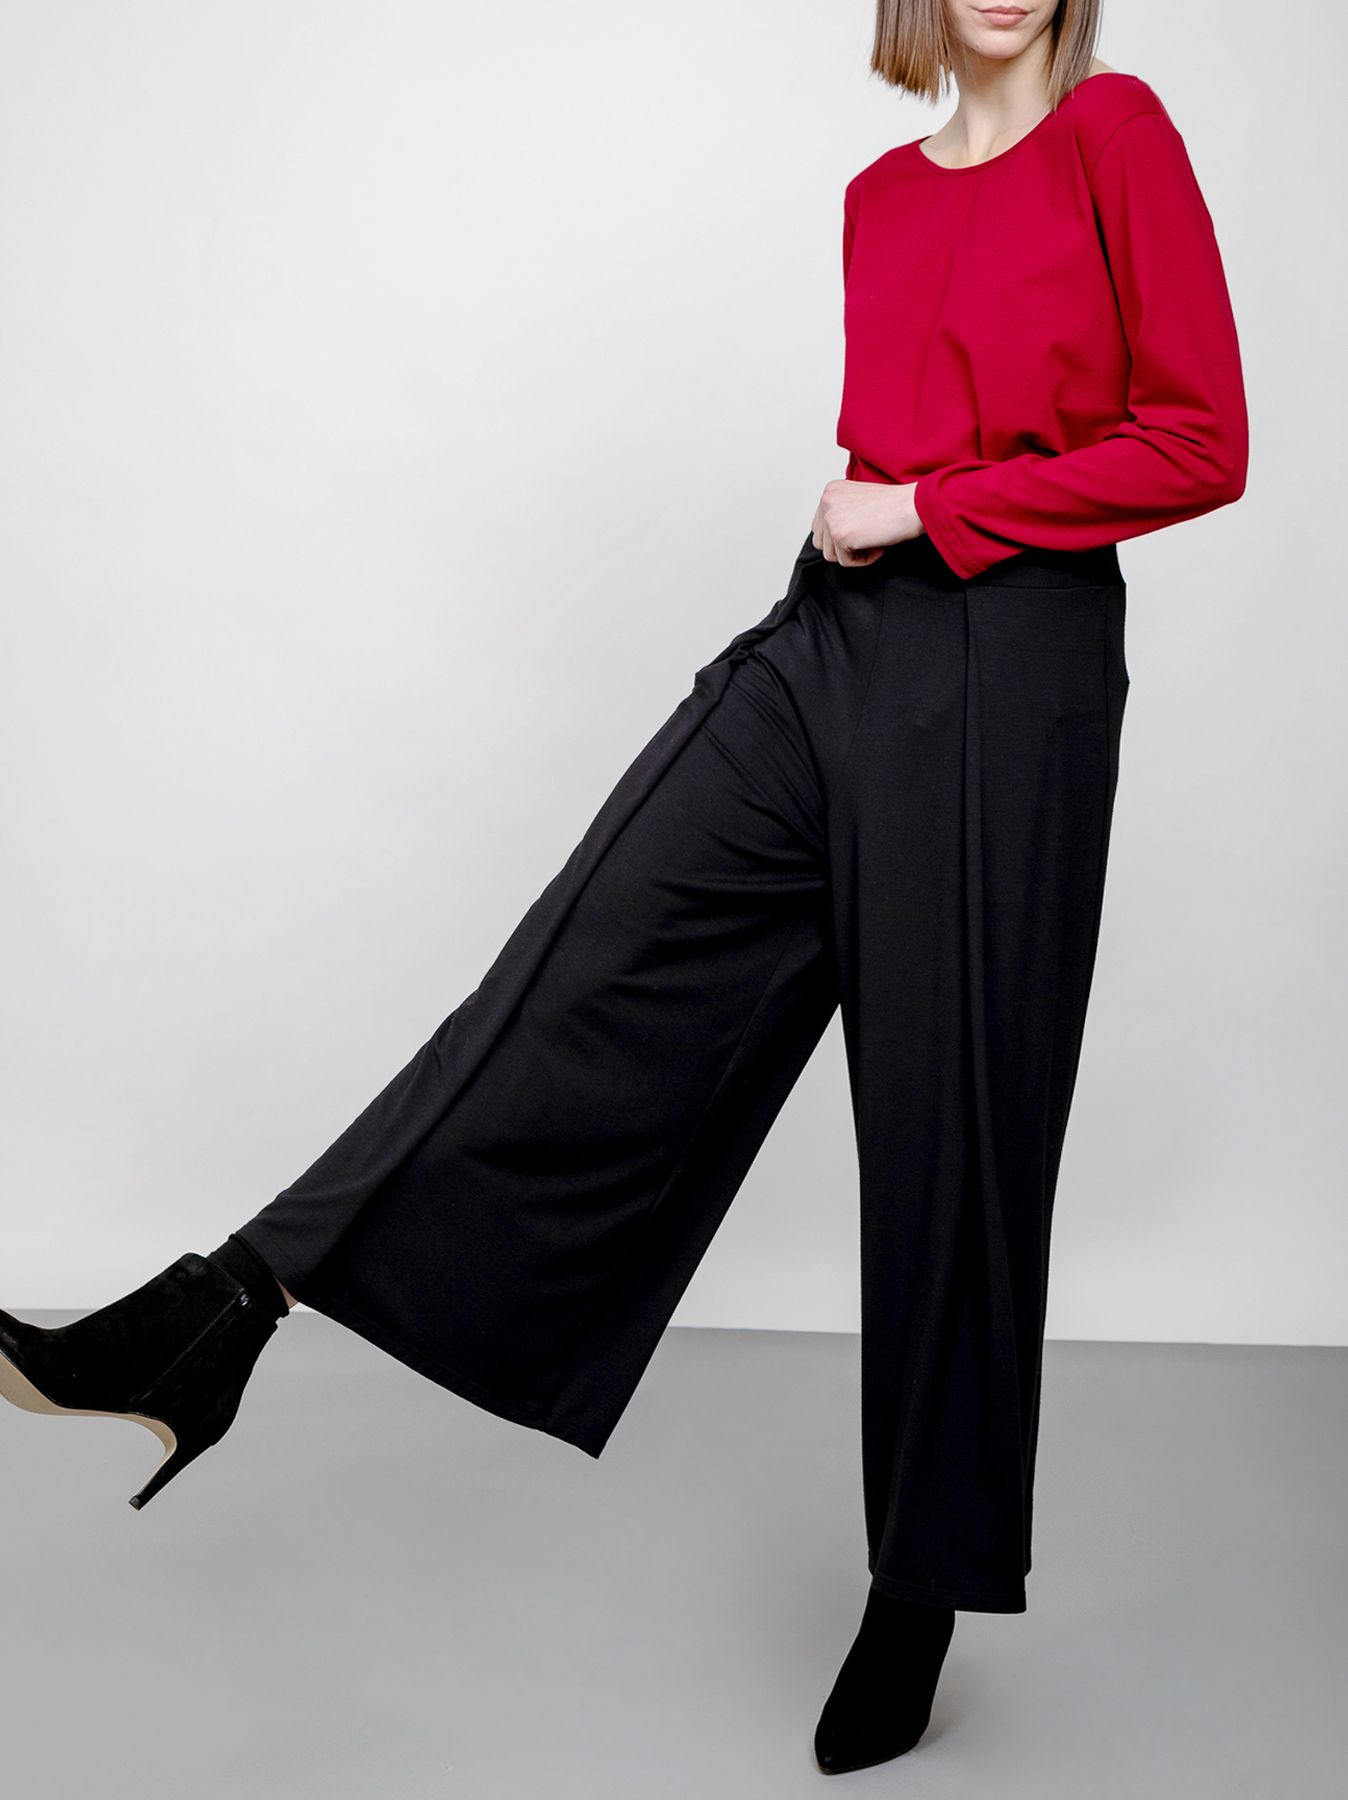 Pantalone gamba larga